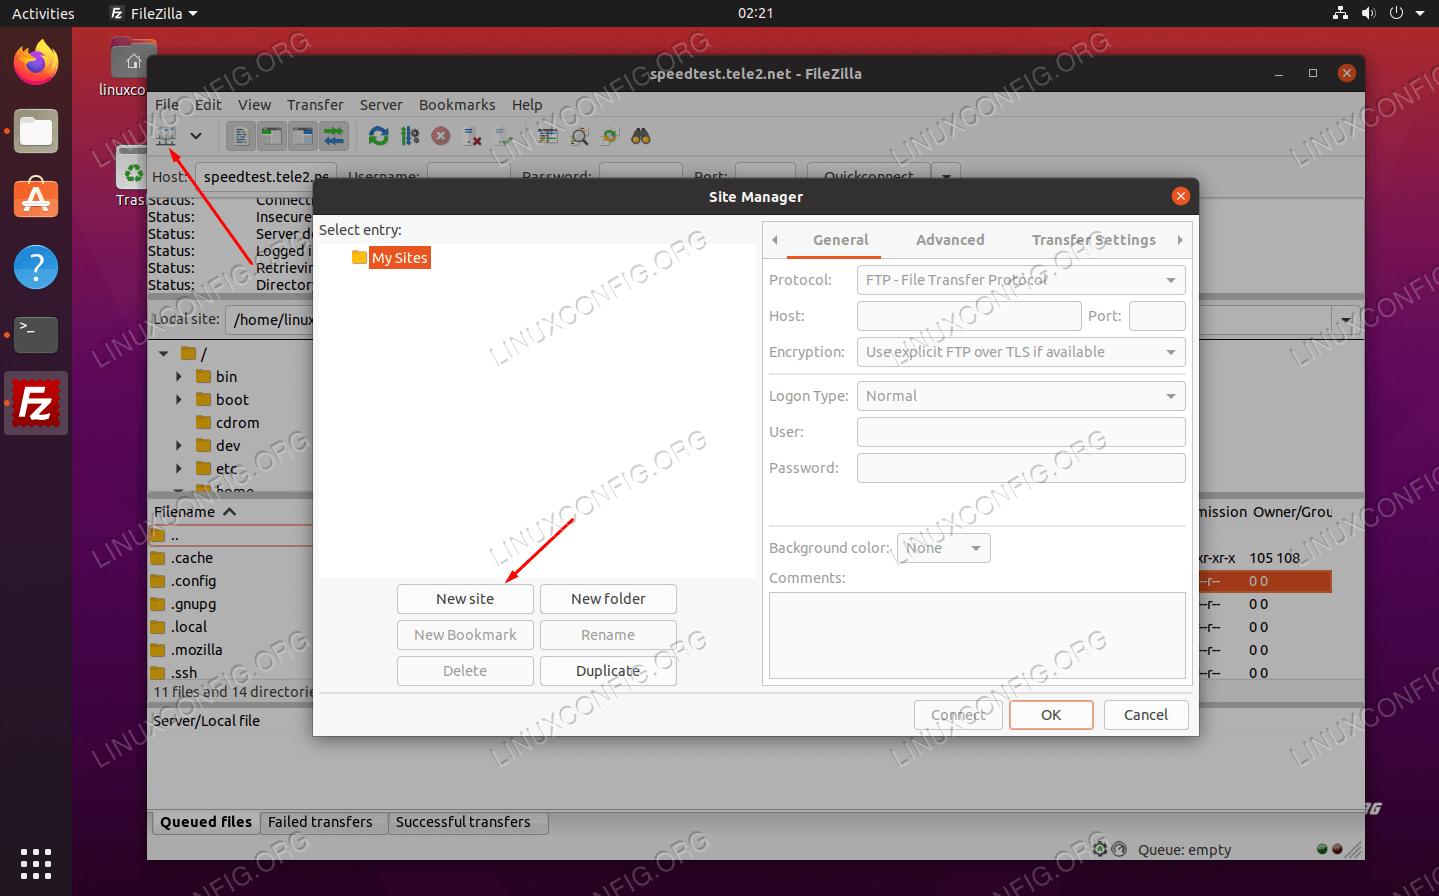 FileZilla site manager interface